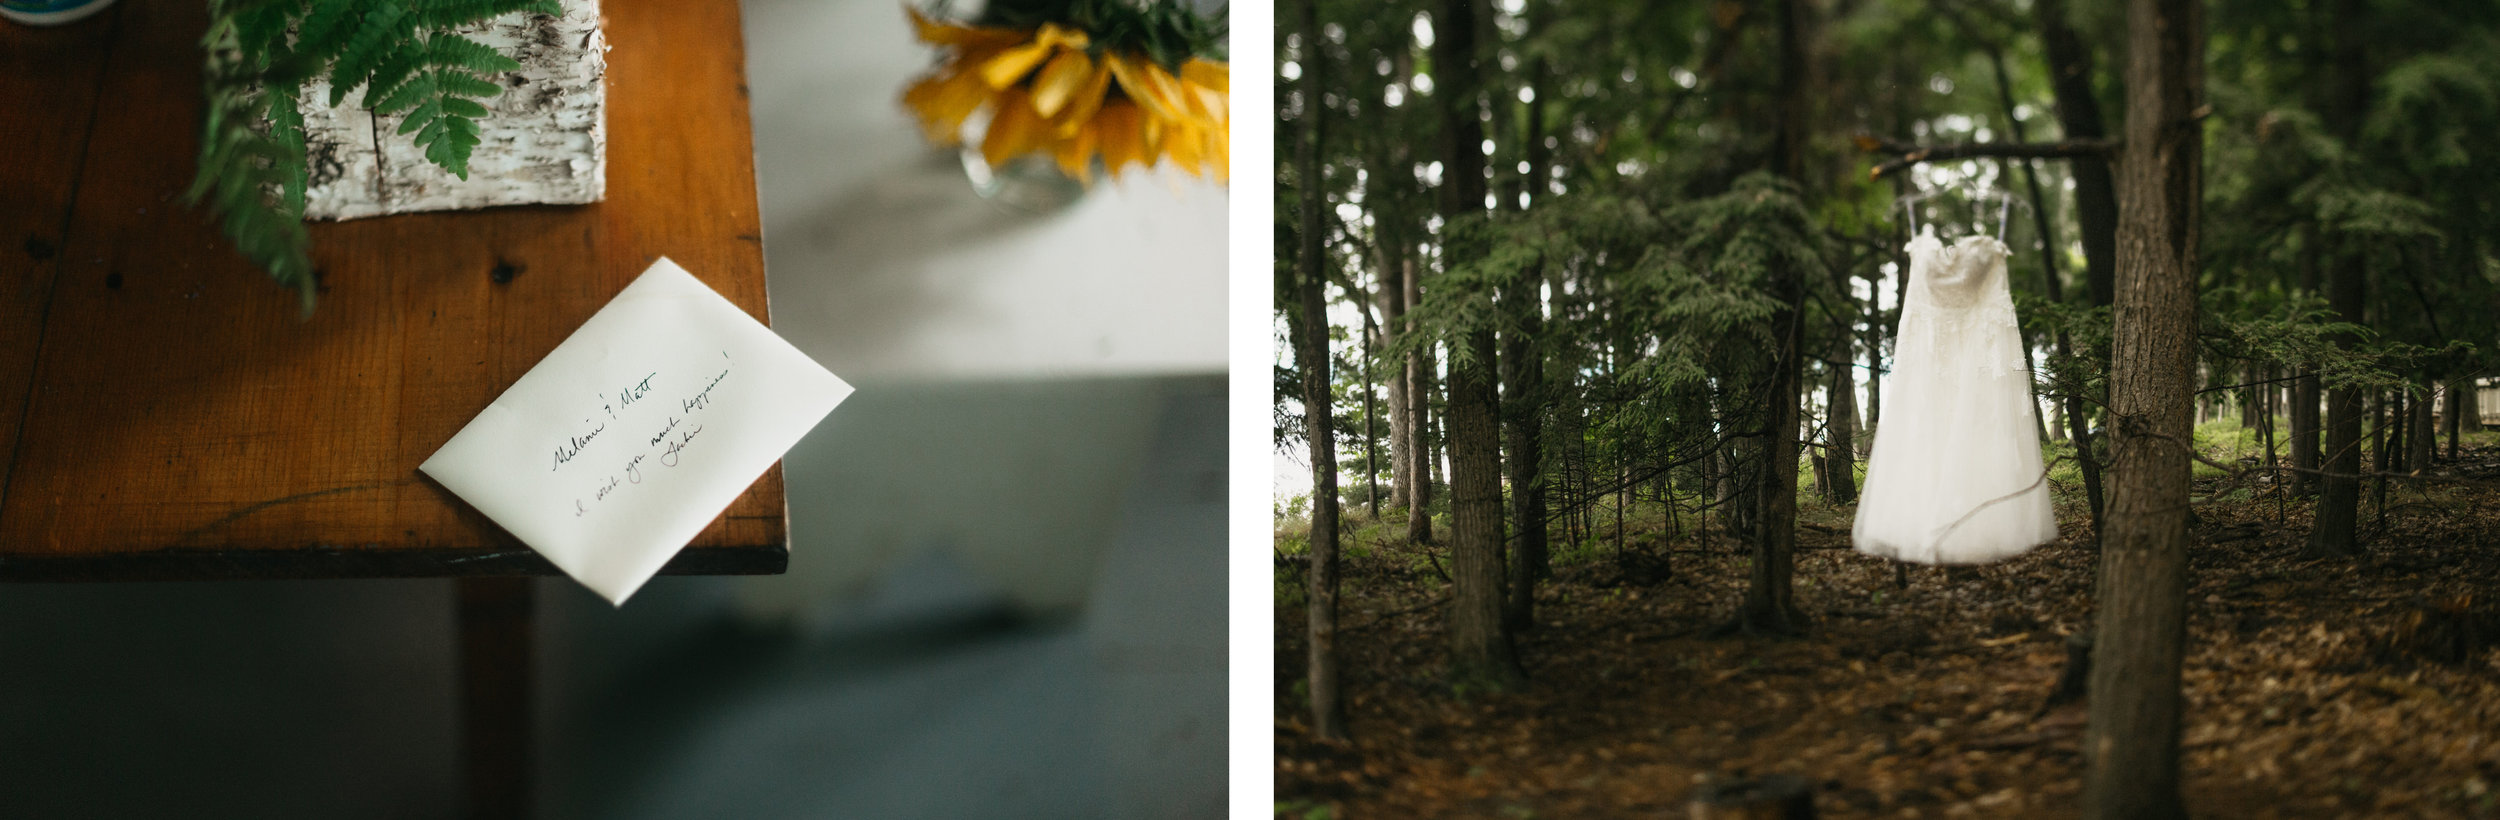 Lake_Michigan_wedding-5 copy.jpg